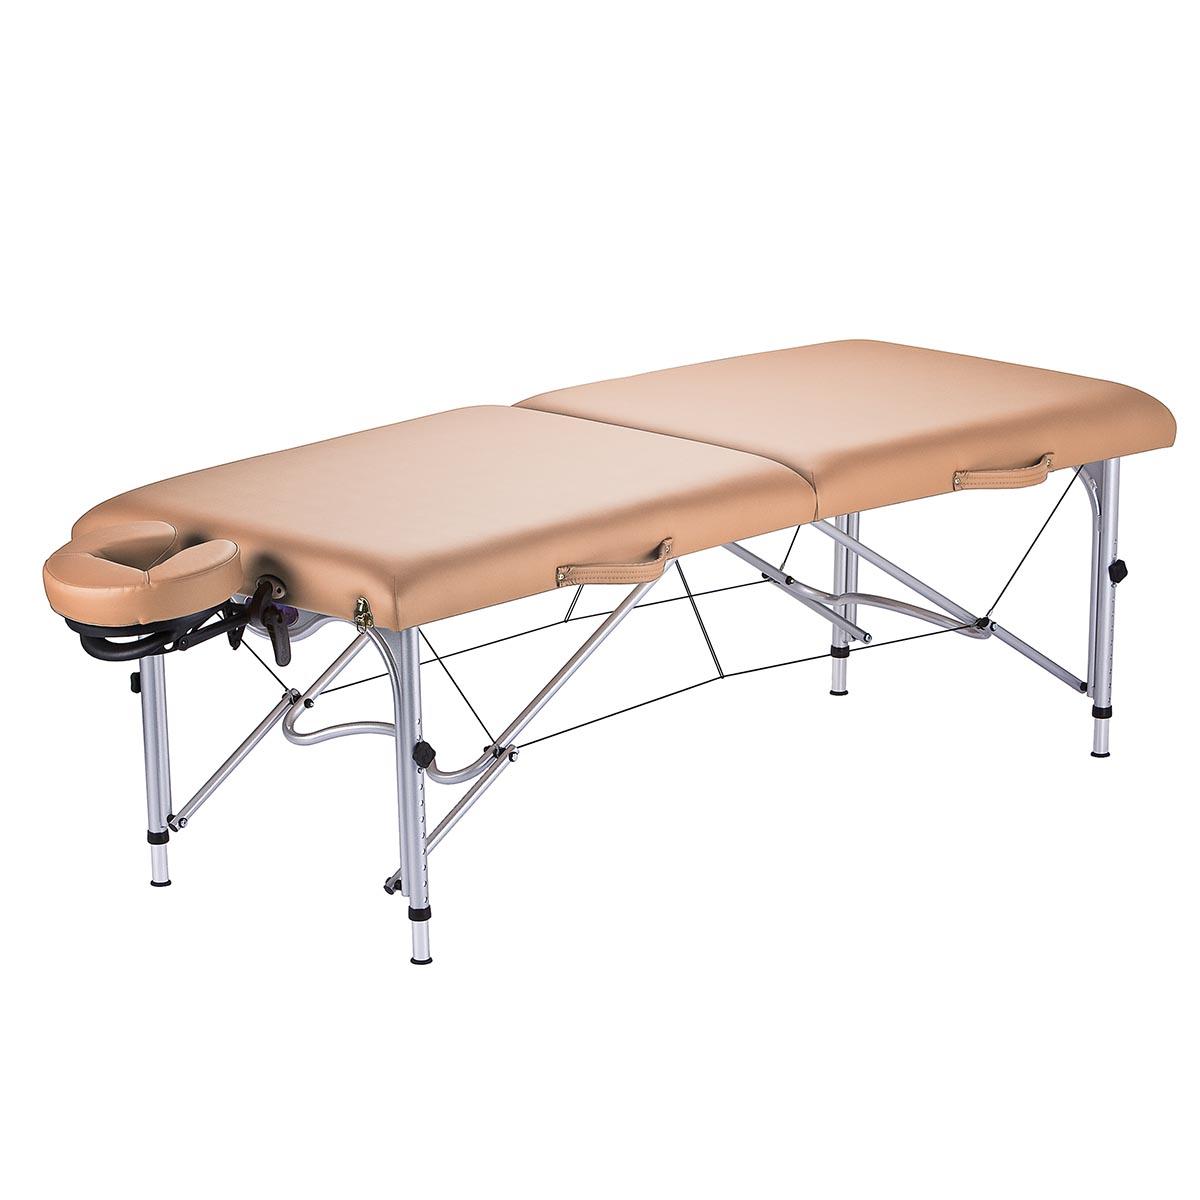 Earthlite luna massage table package massage tables for Massage table